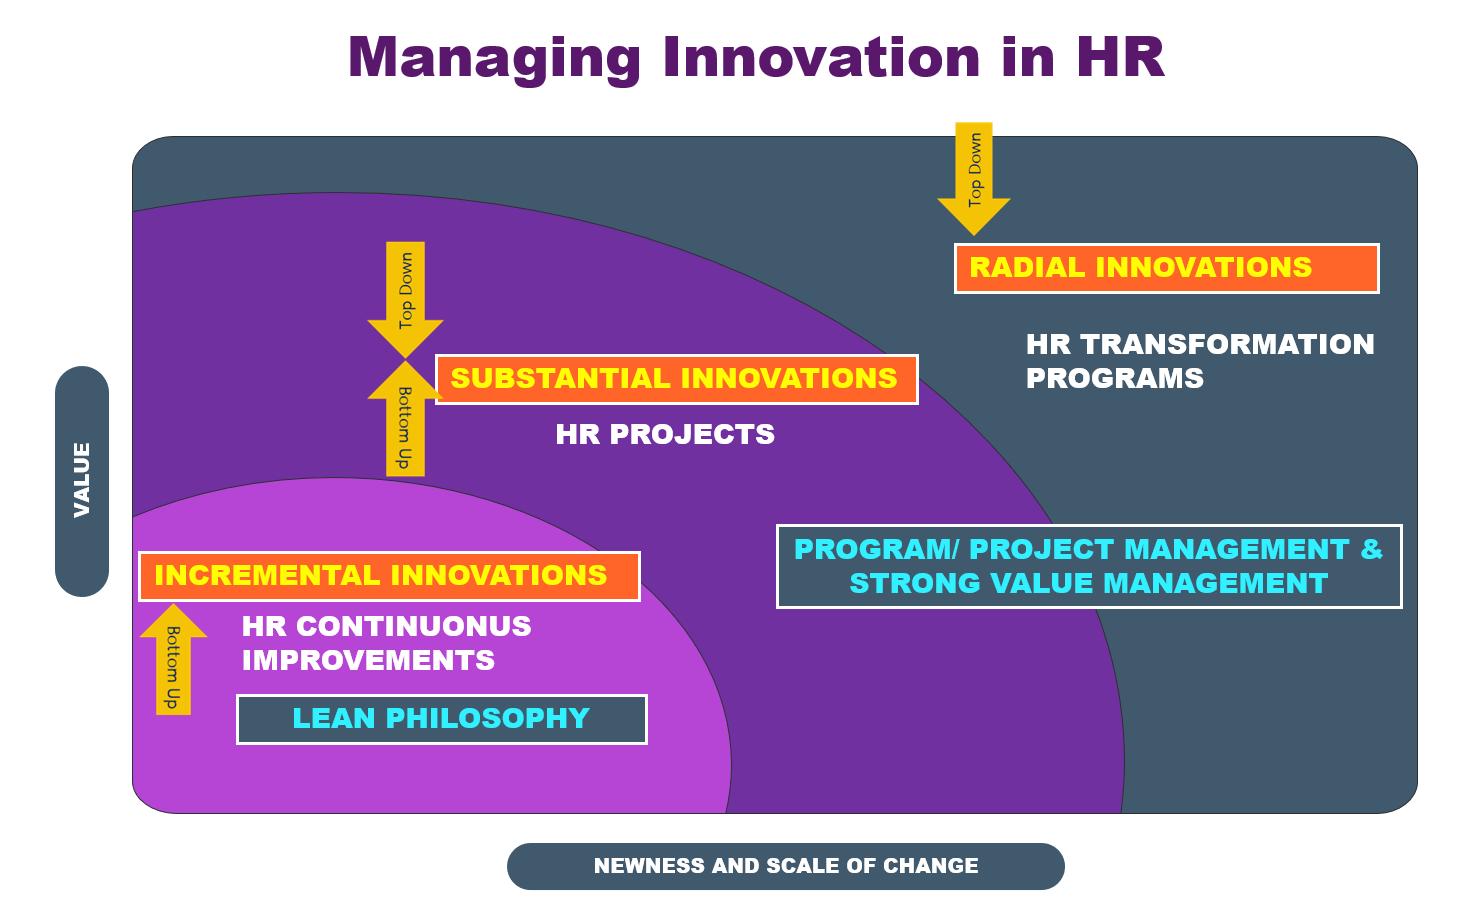 HR innovation management